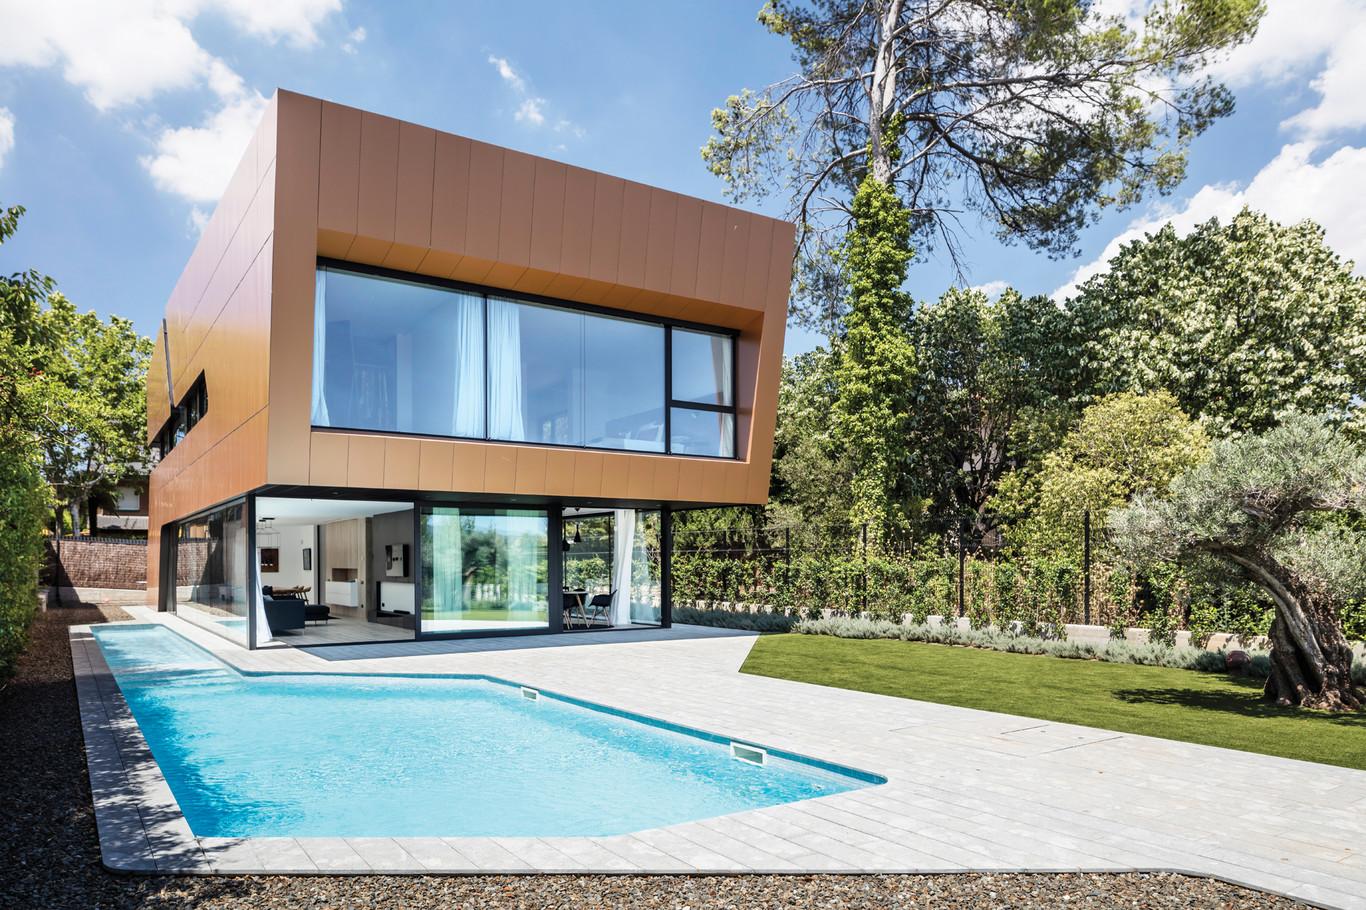 Casa sostenible de dise o arquima revista arquitectura for Arquitectura y diseno de casas